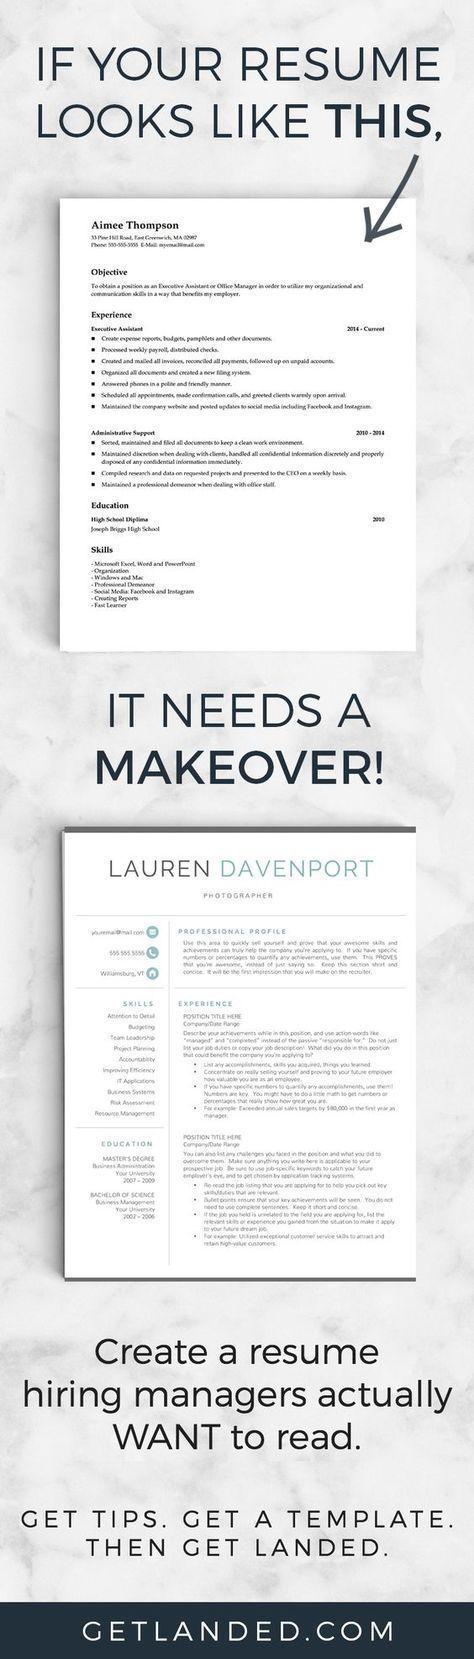 Resume Writers Nyc 9 Best Resumes Internships & Job Tips Images On Pinterest  Resume .